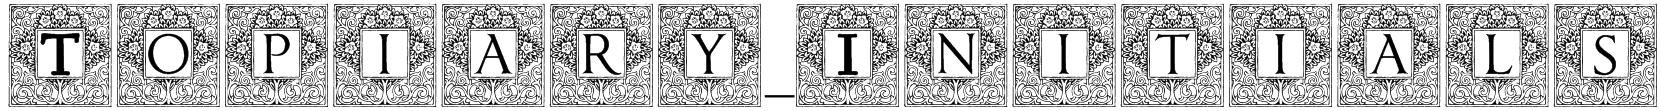 Topiary_Initials Font